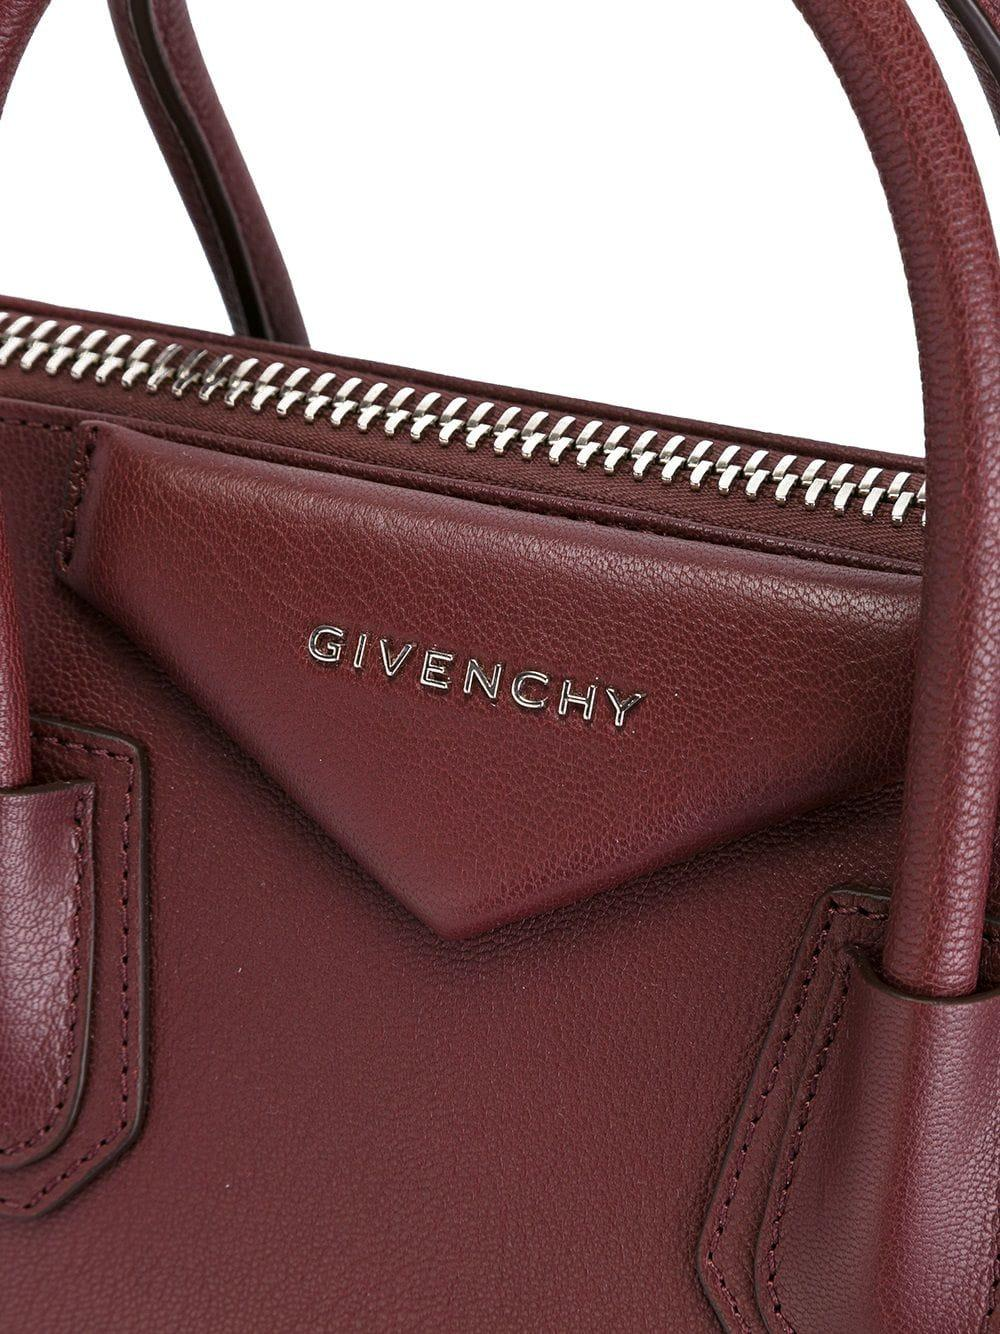 9d09ebccc513 Givenchy - Pink Small Antigona Tote - Lyst. View fullscreen